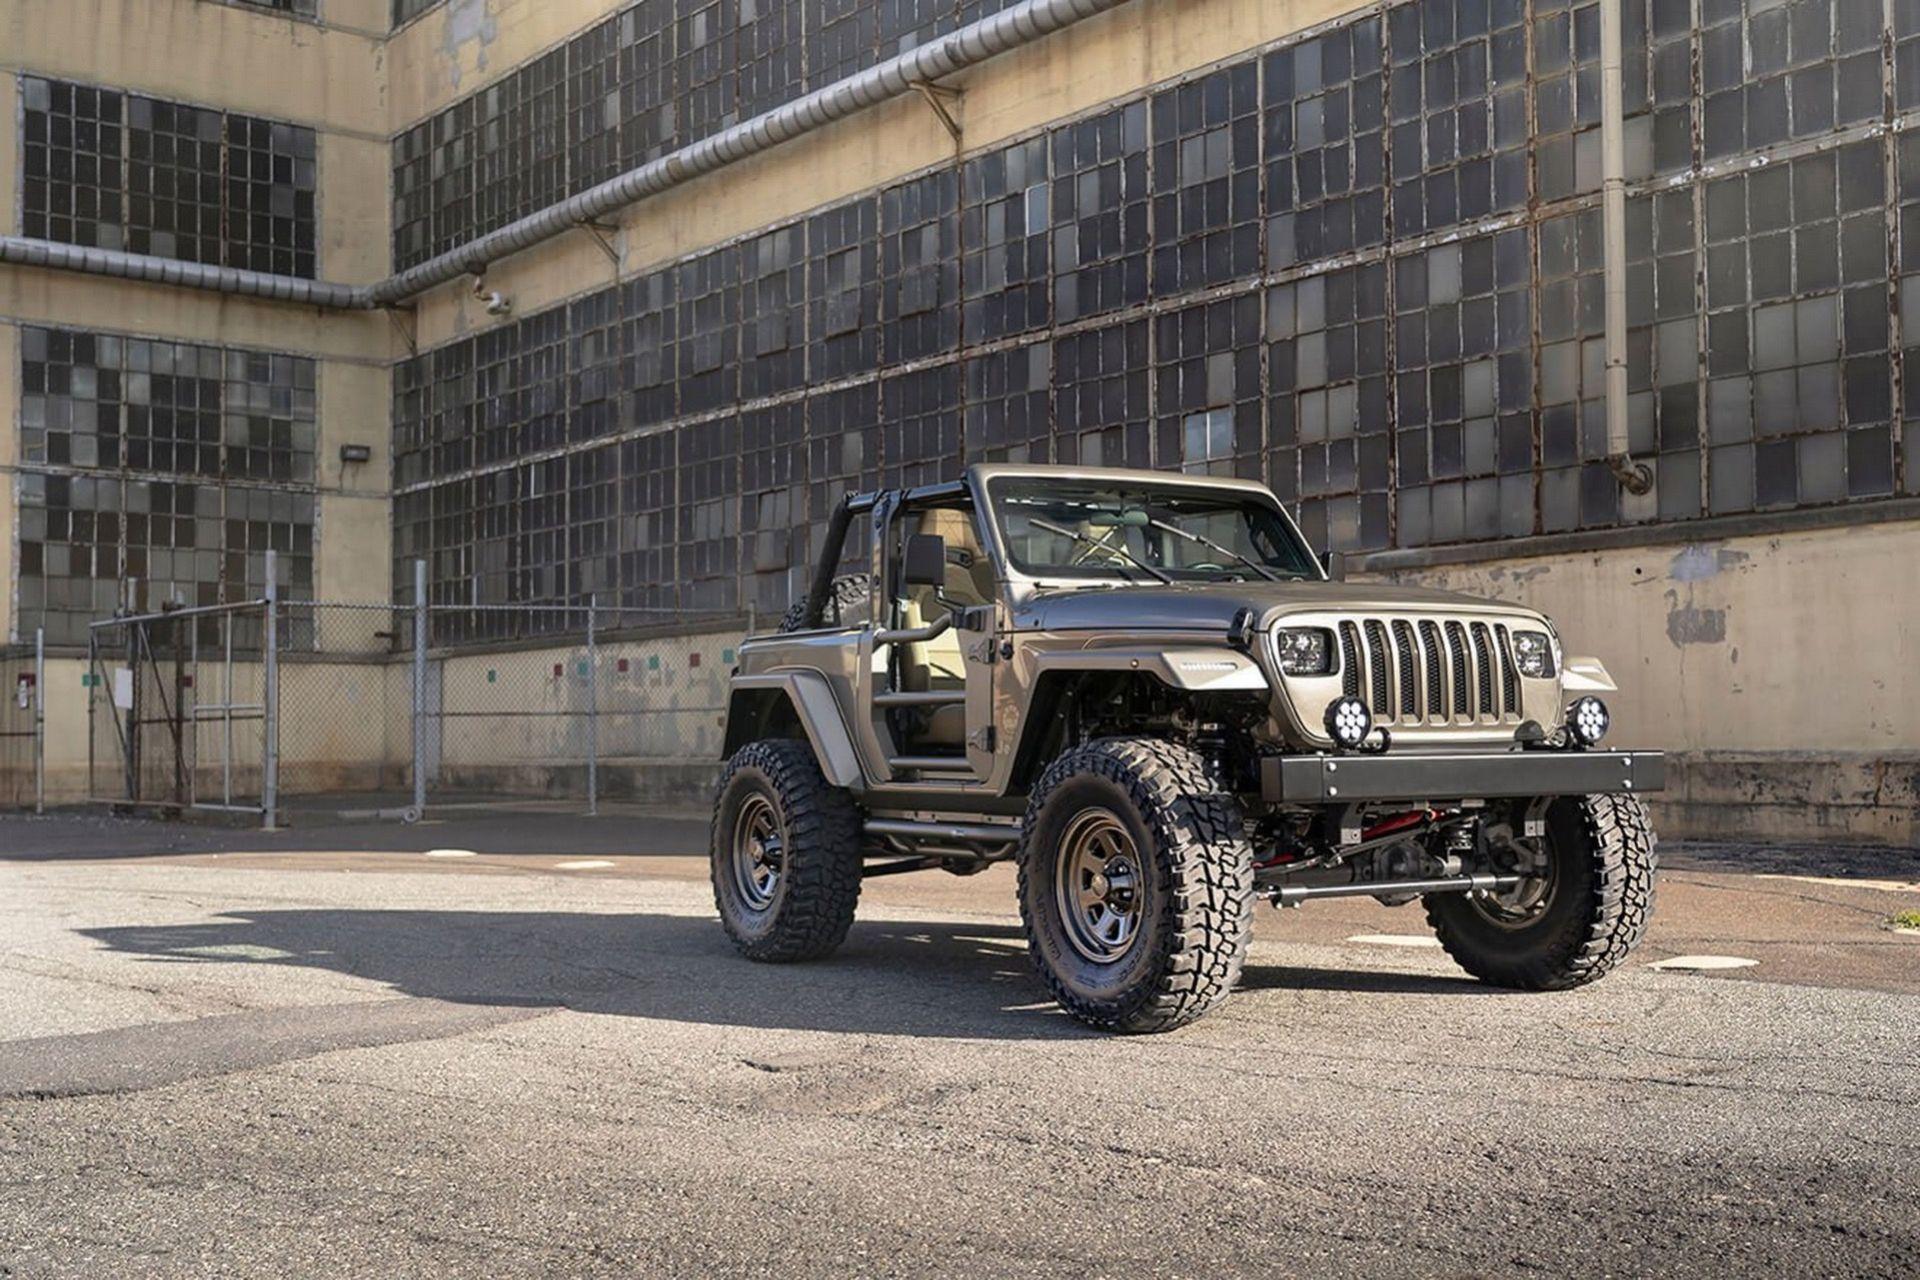 Nya Jeep Wrangler med gammalt utseende